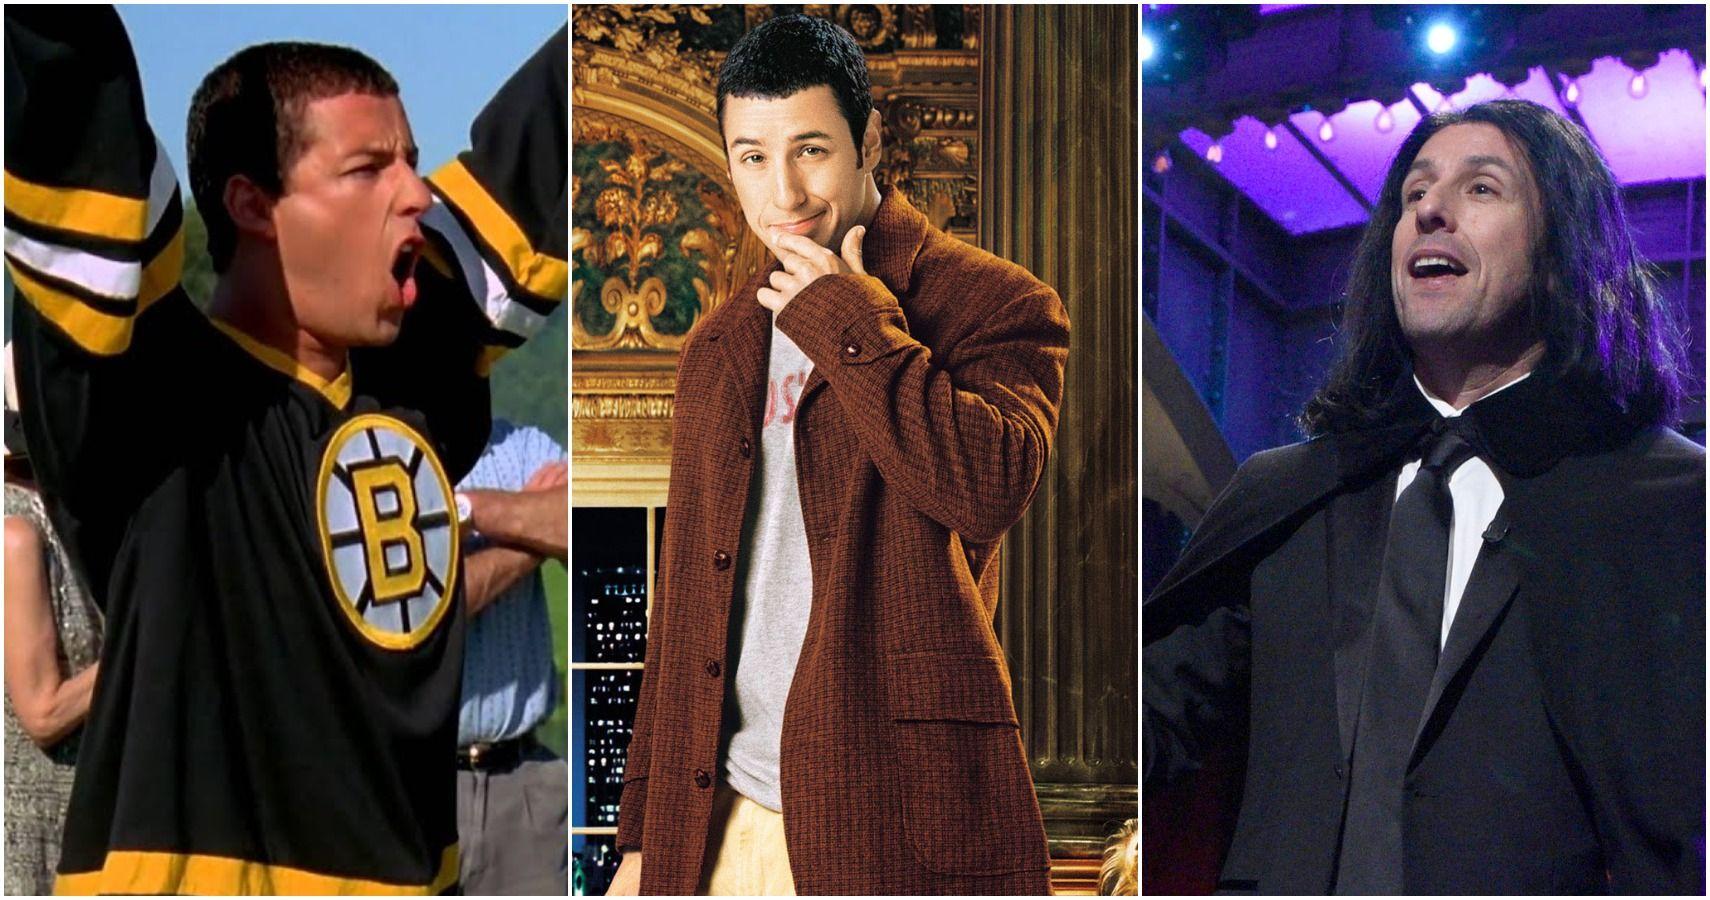 Ranking Adam Sandler's 10 Funniest Characters